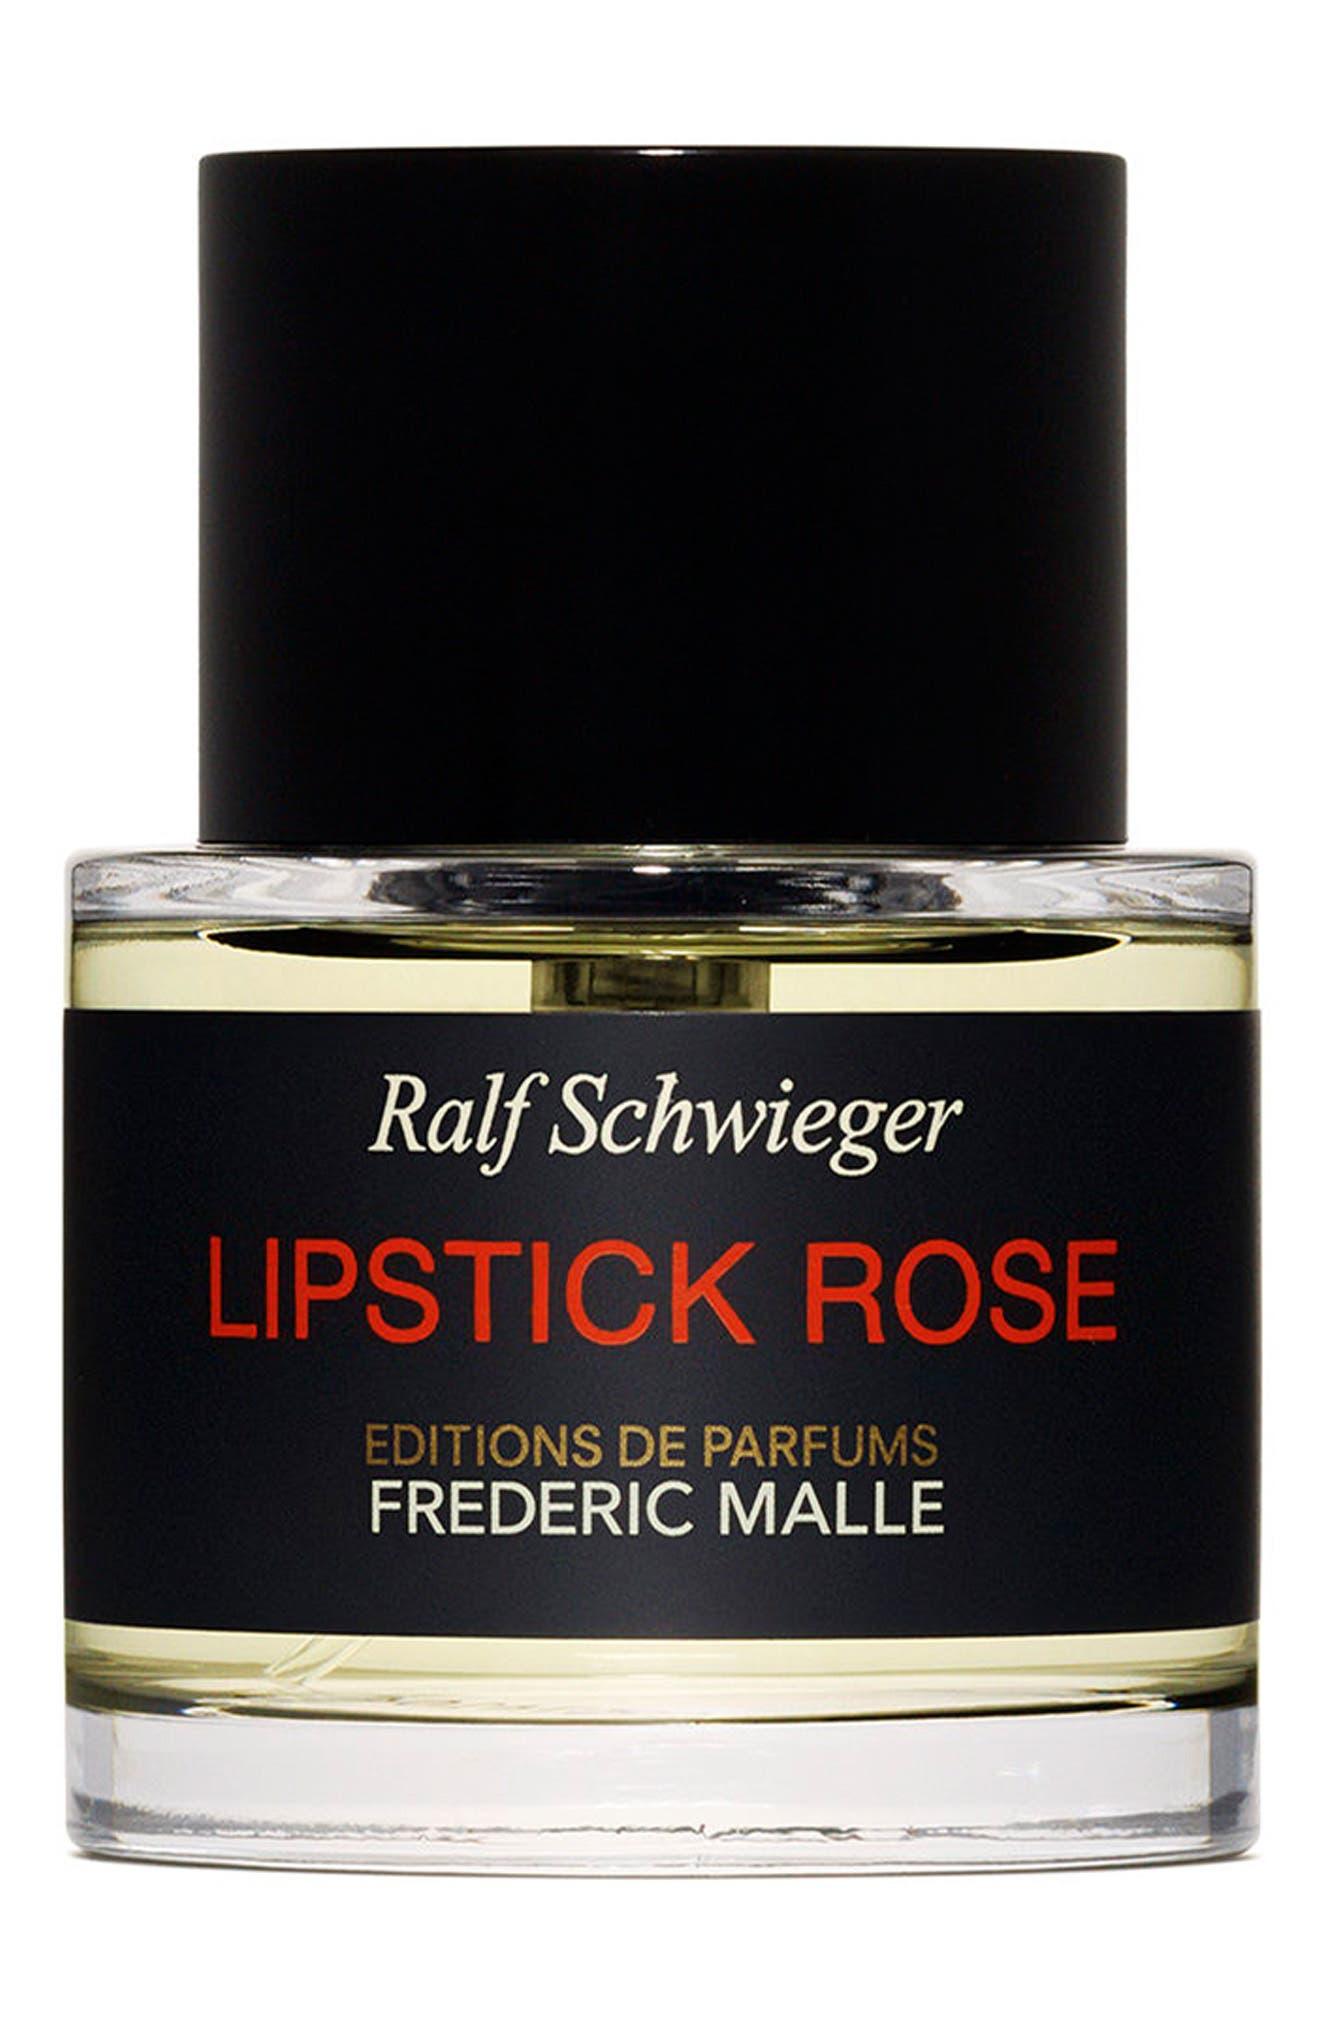 Editions de Parfums Frédéric Malle Lipstick Rose Travel Fragrance